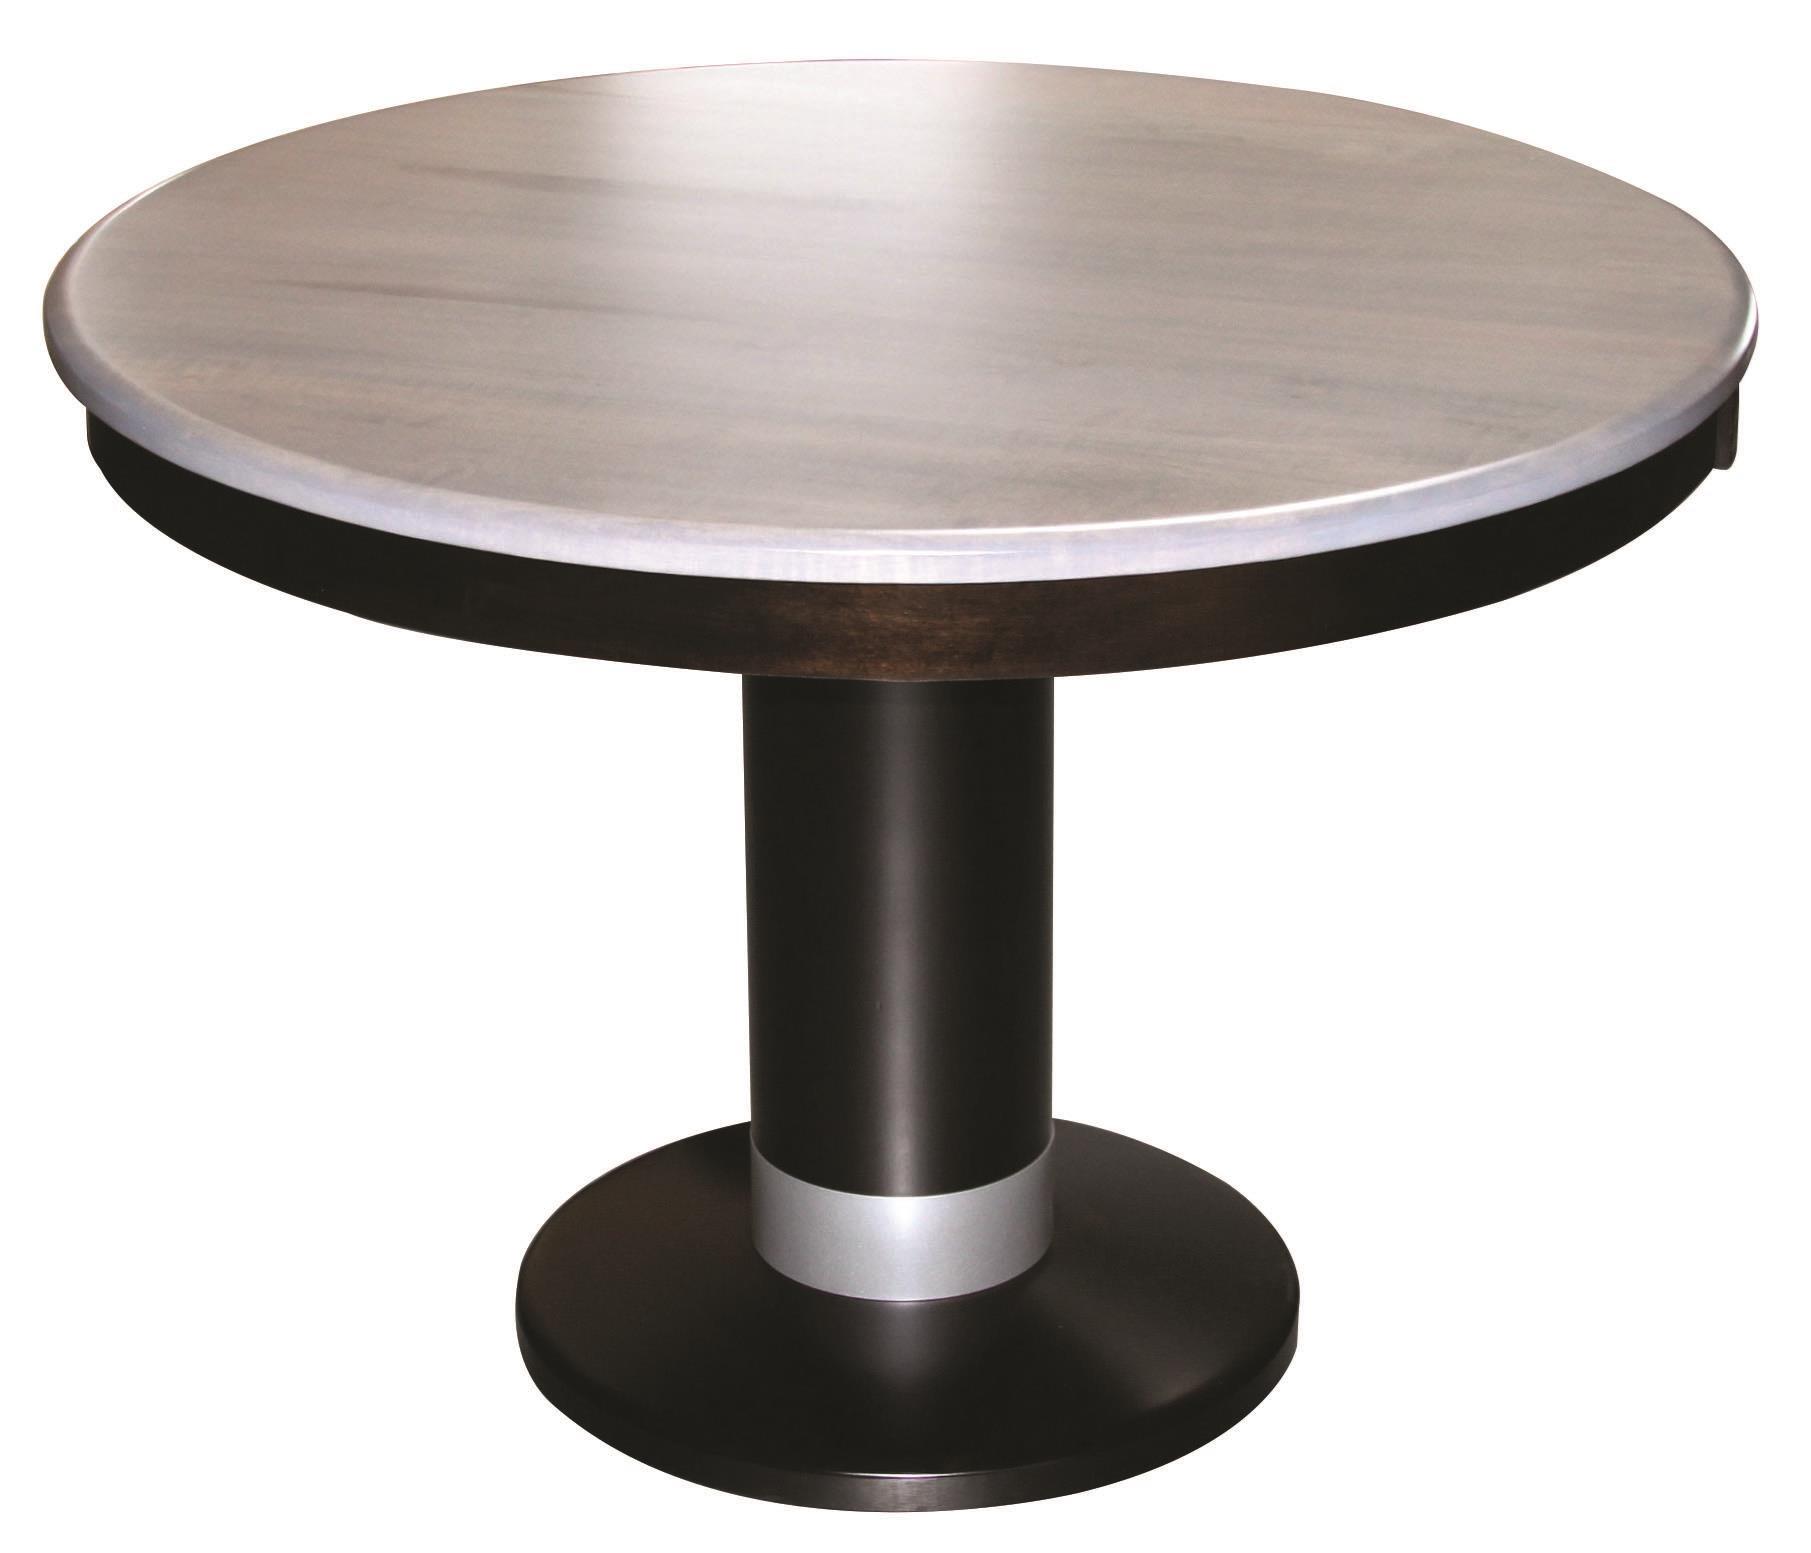 Alcoe Round Single Pedestal Table